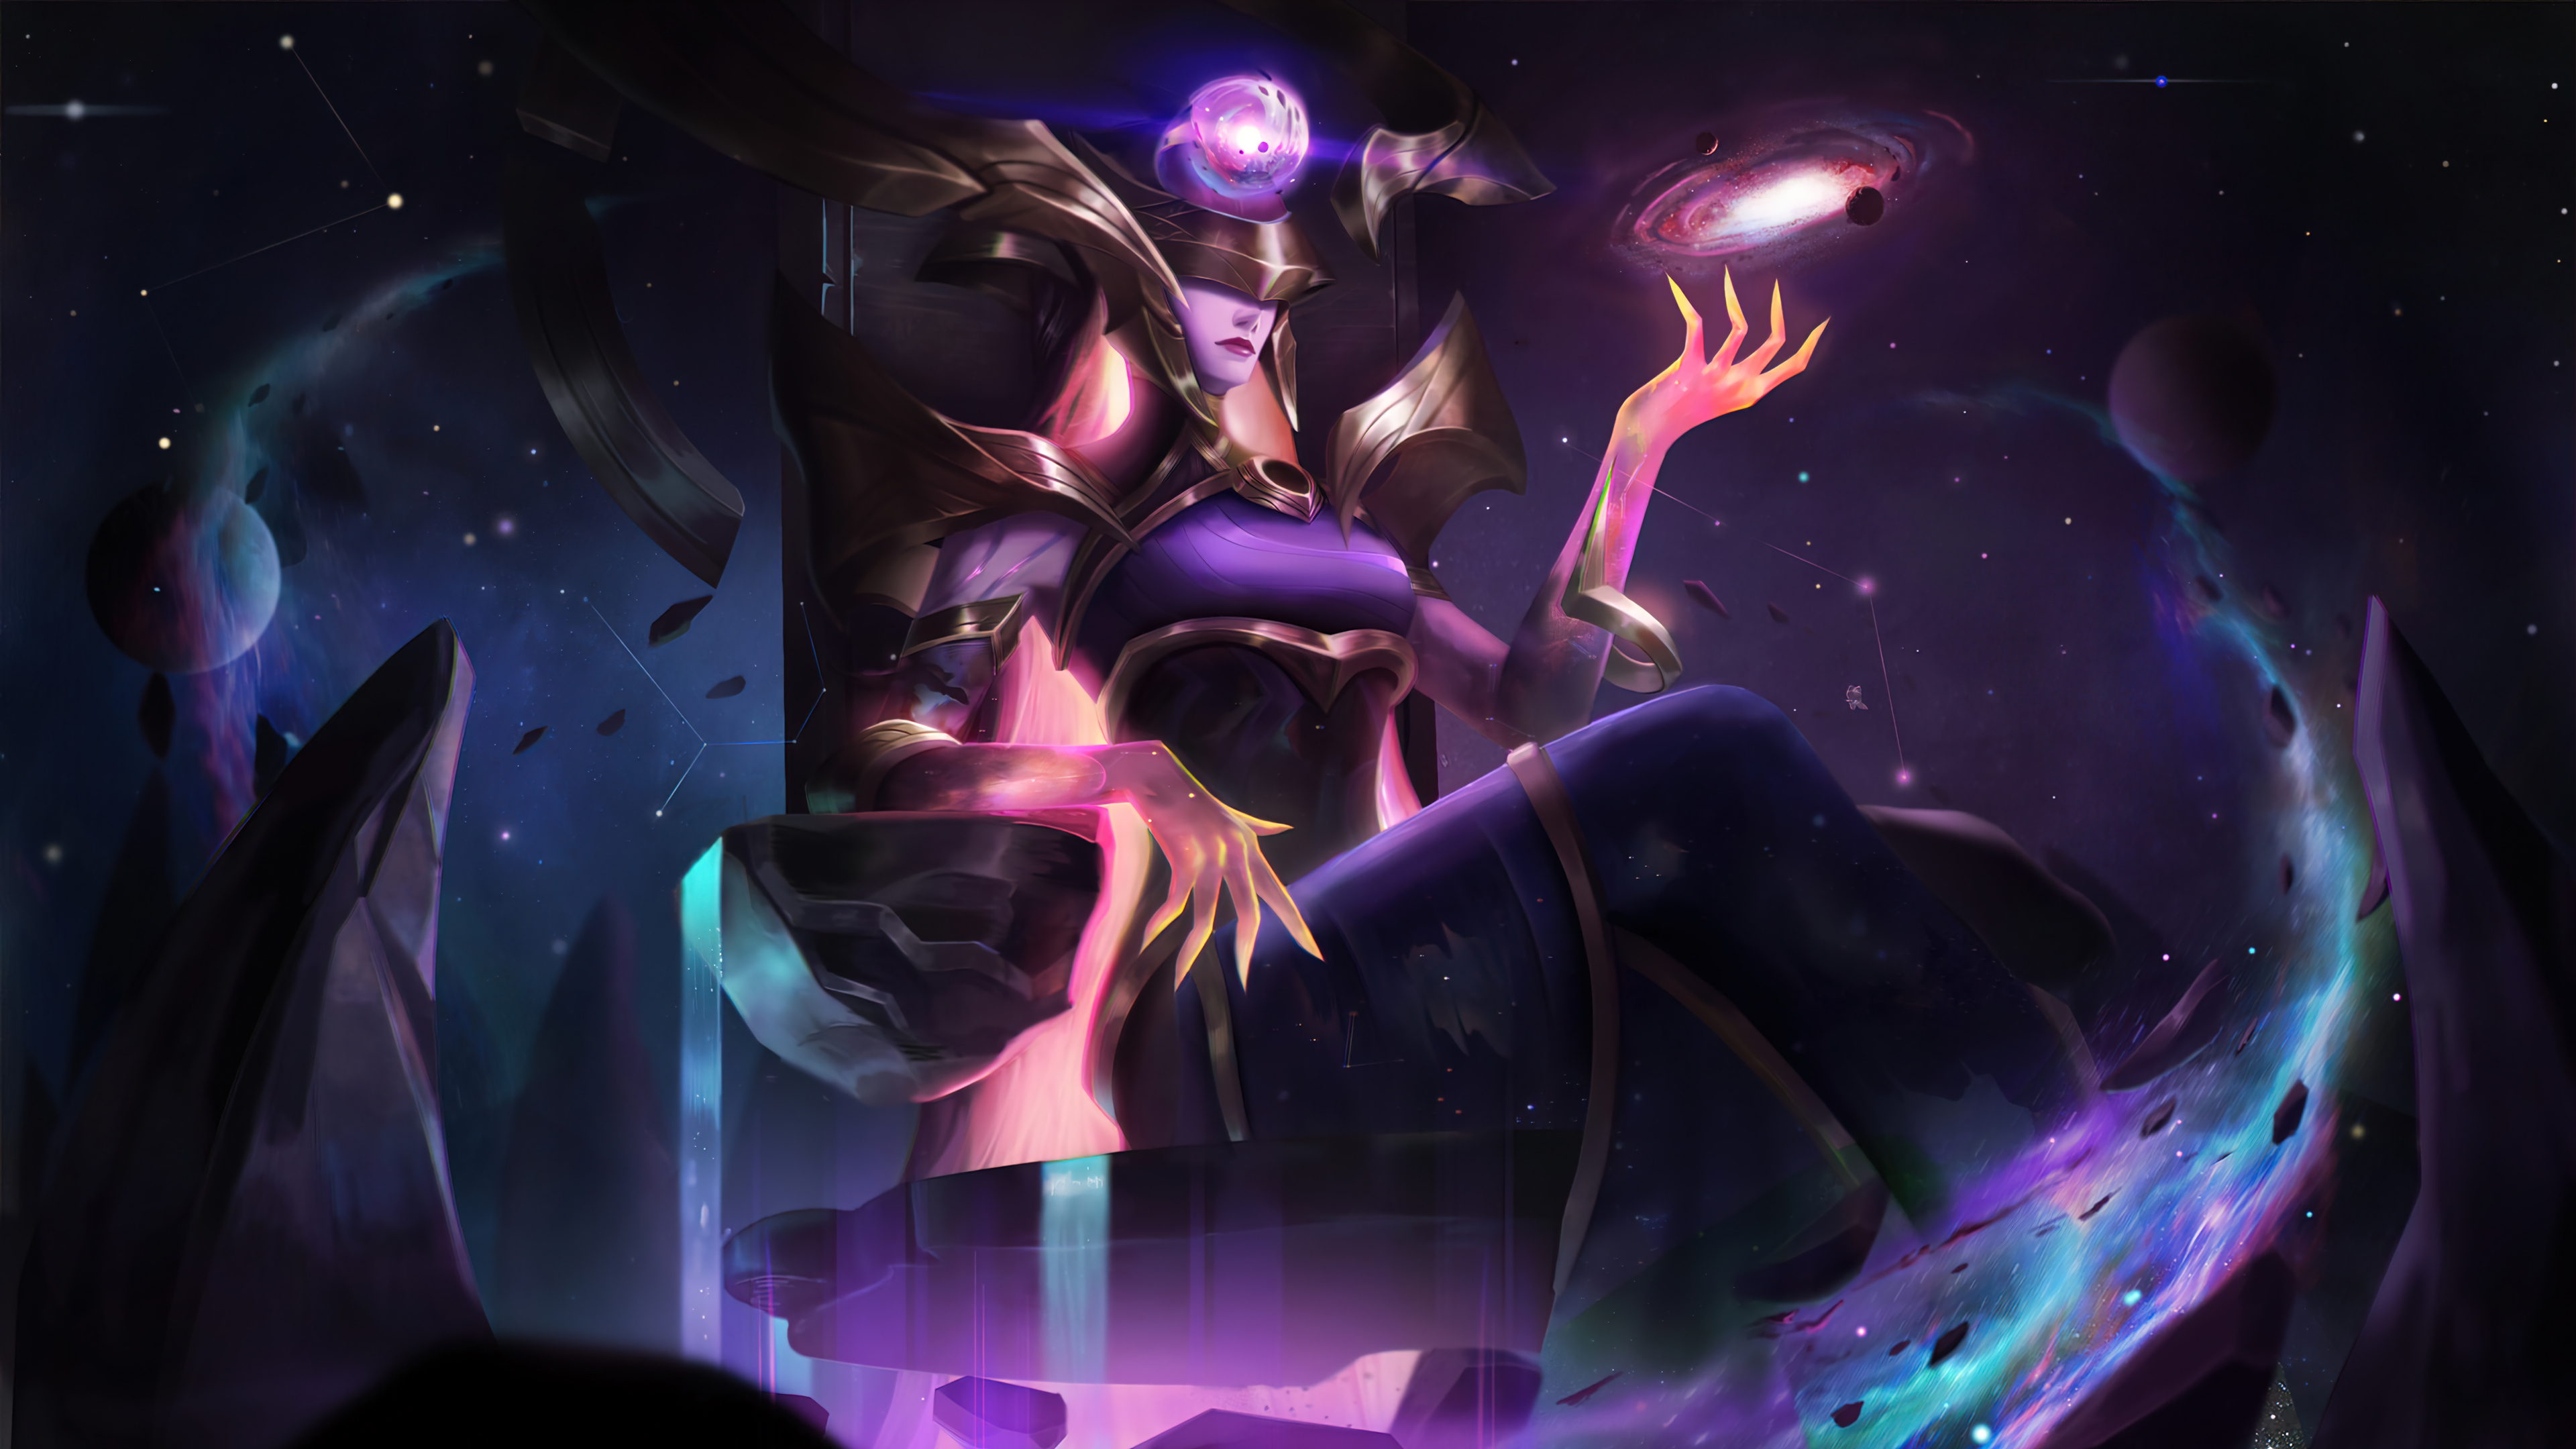 Wallpaper Lissandra dark star League of Legends